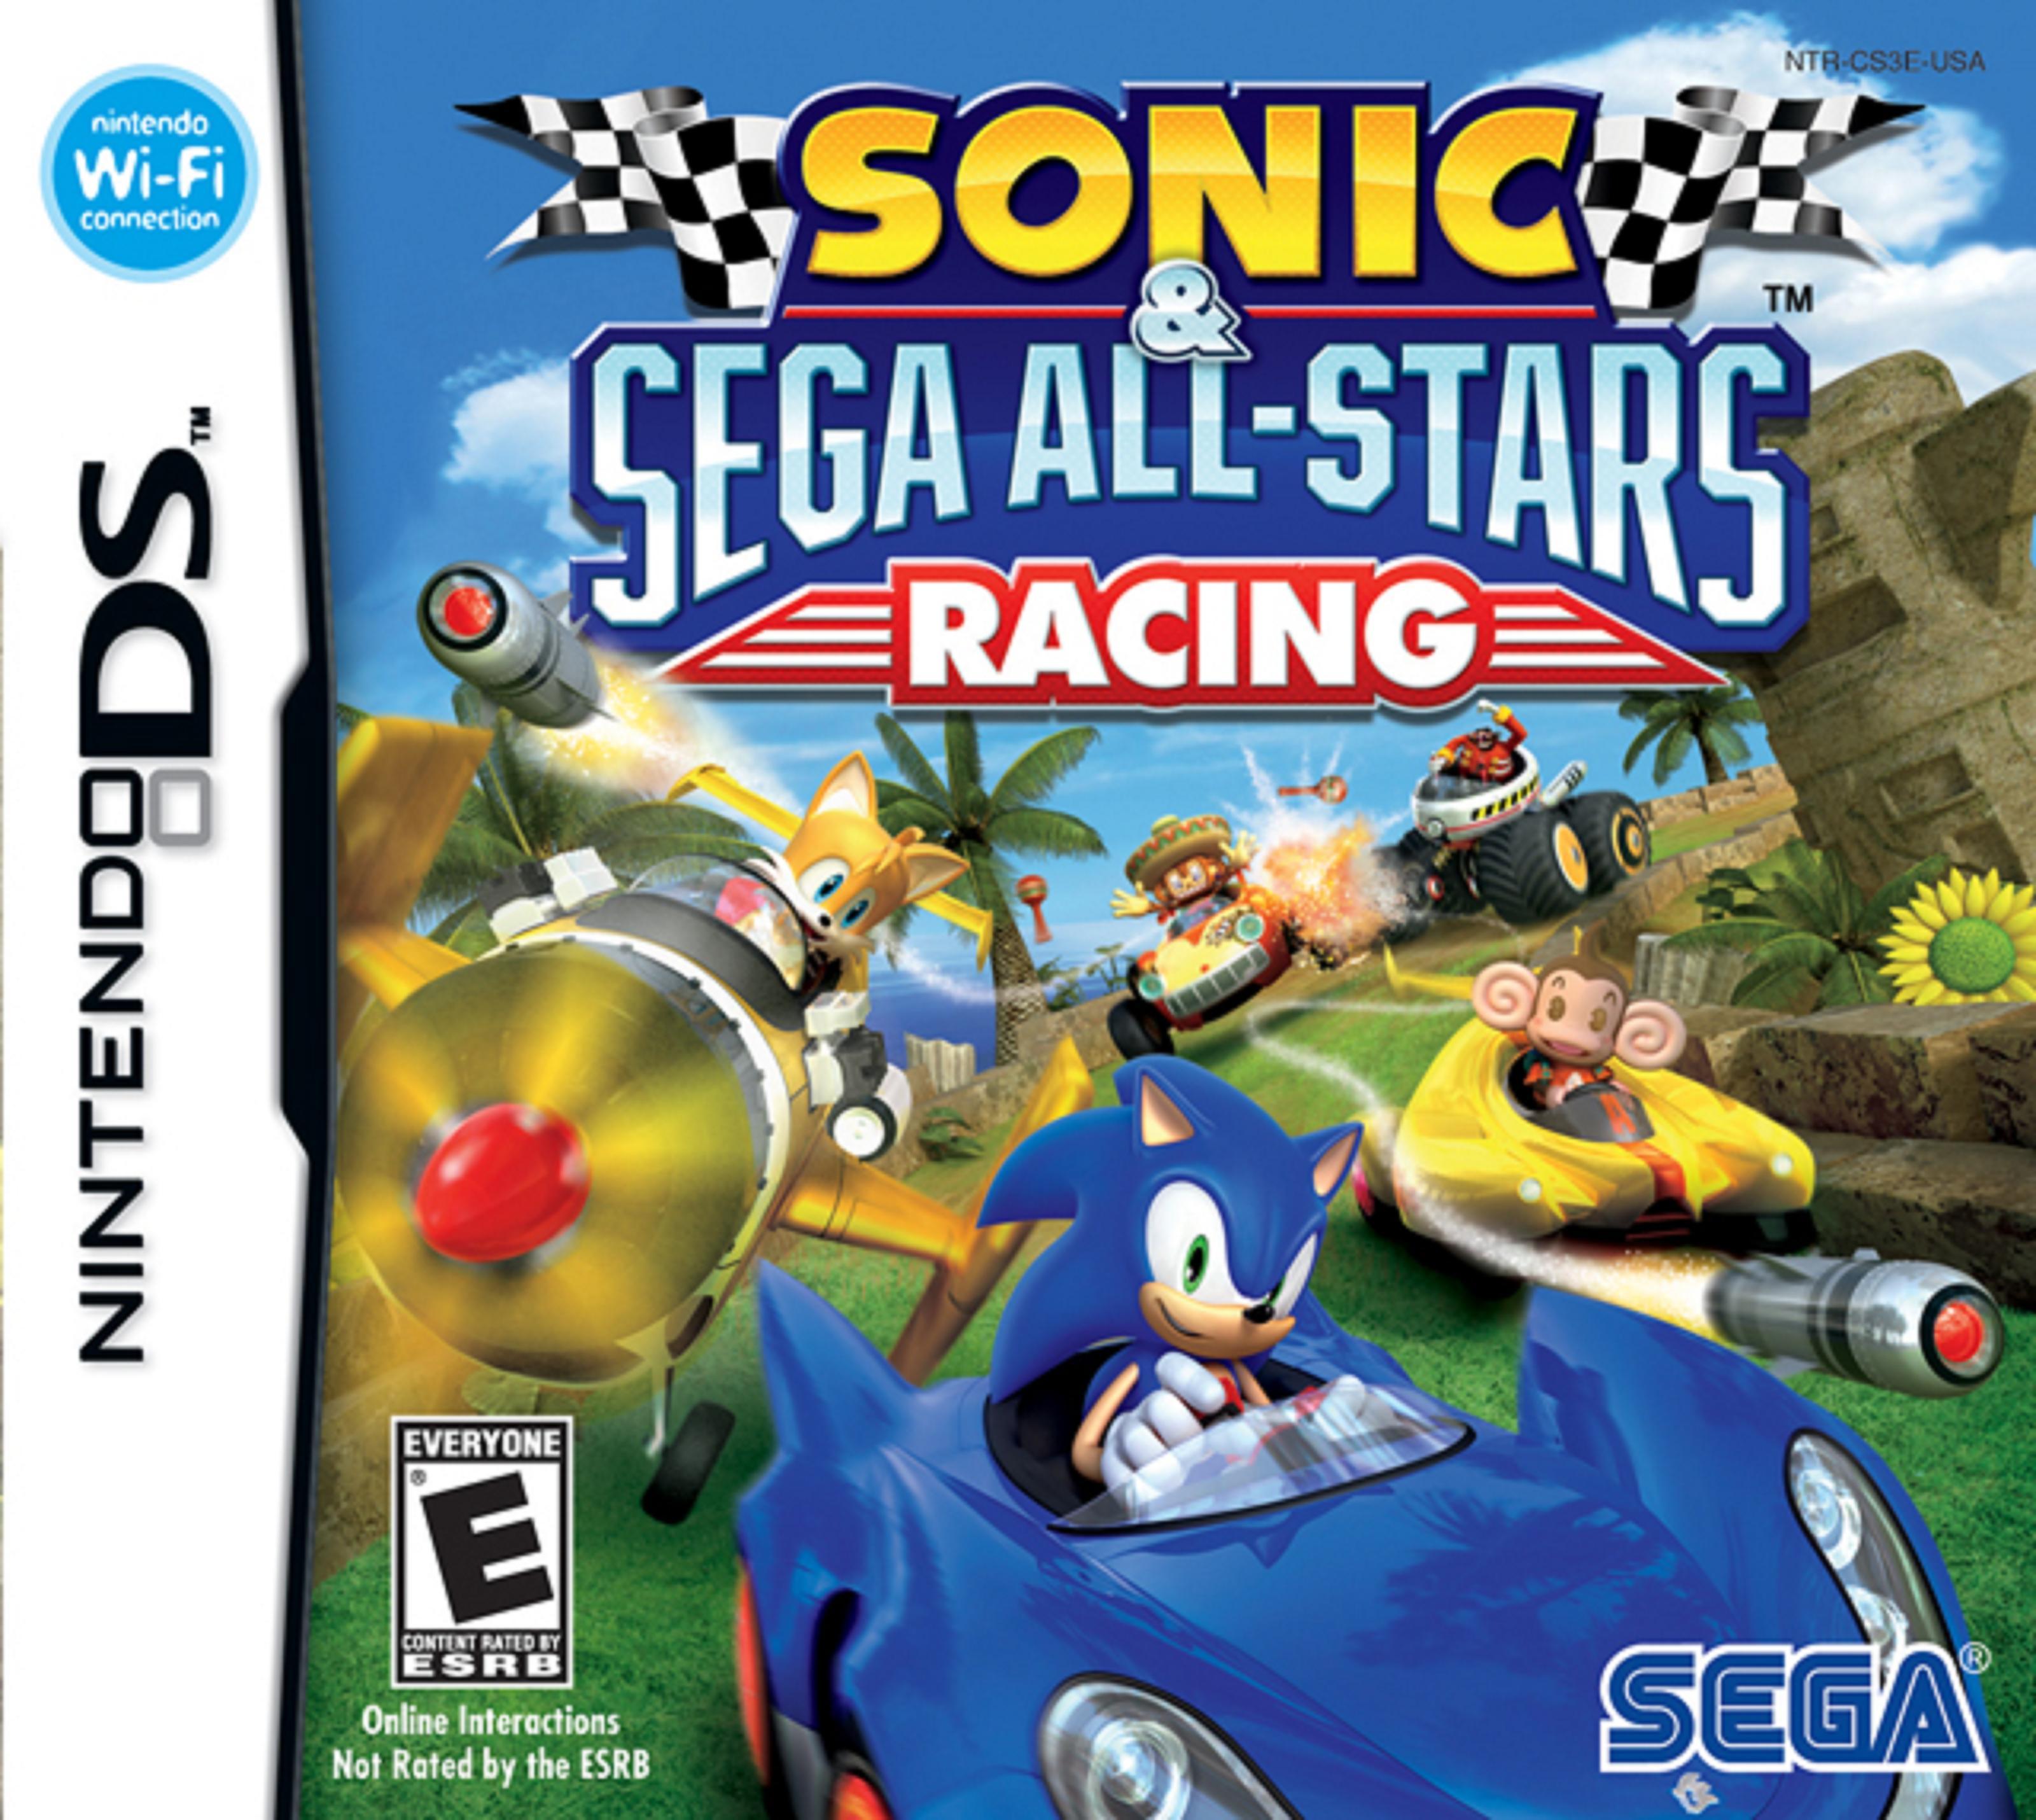 Sonic & Sega All-Stars Racing (Video Game 2010) - IMDb